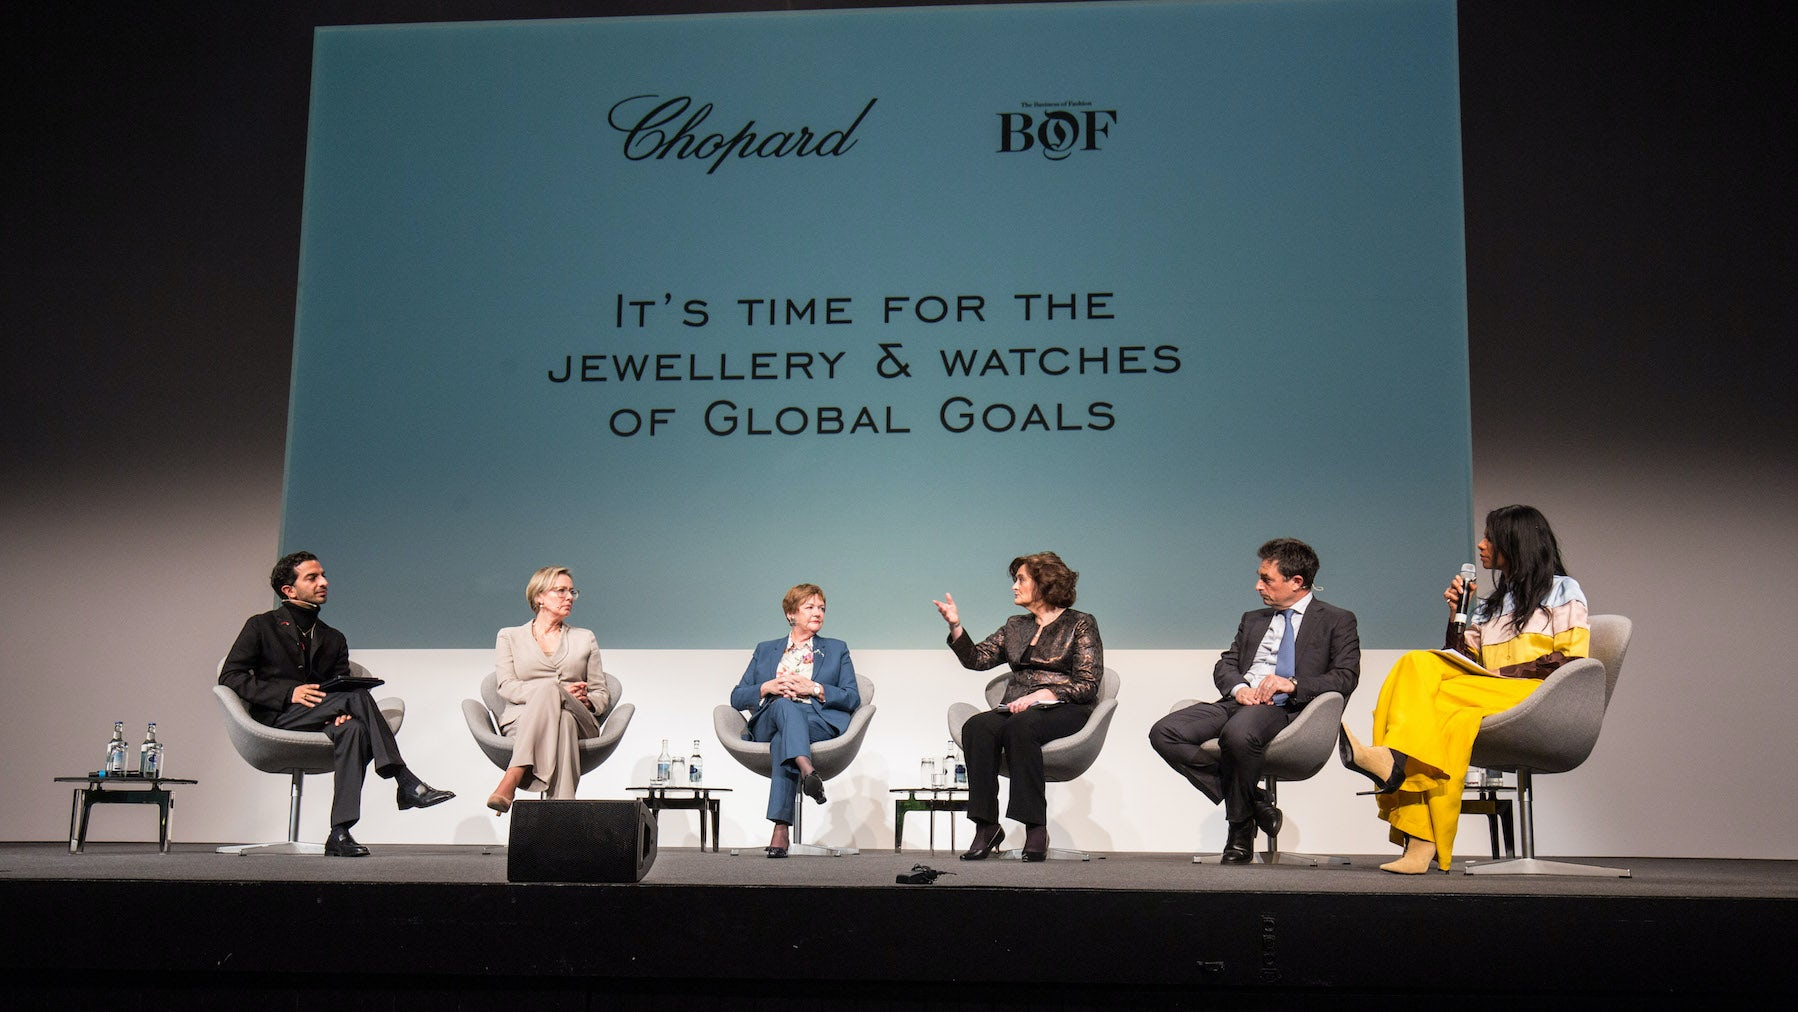 (L-R) Imran Amed, Lena Wendlen, Pamela Gillies, Cherie Blair, Phillipe Fornier, Nöella Coursaris